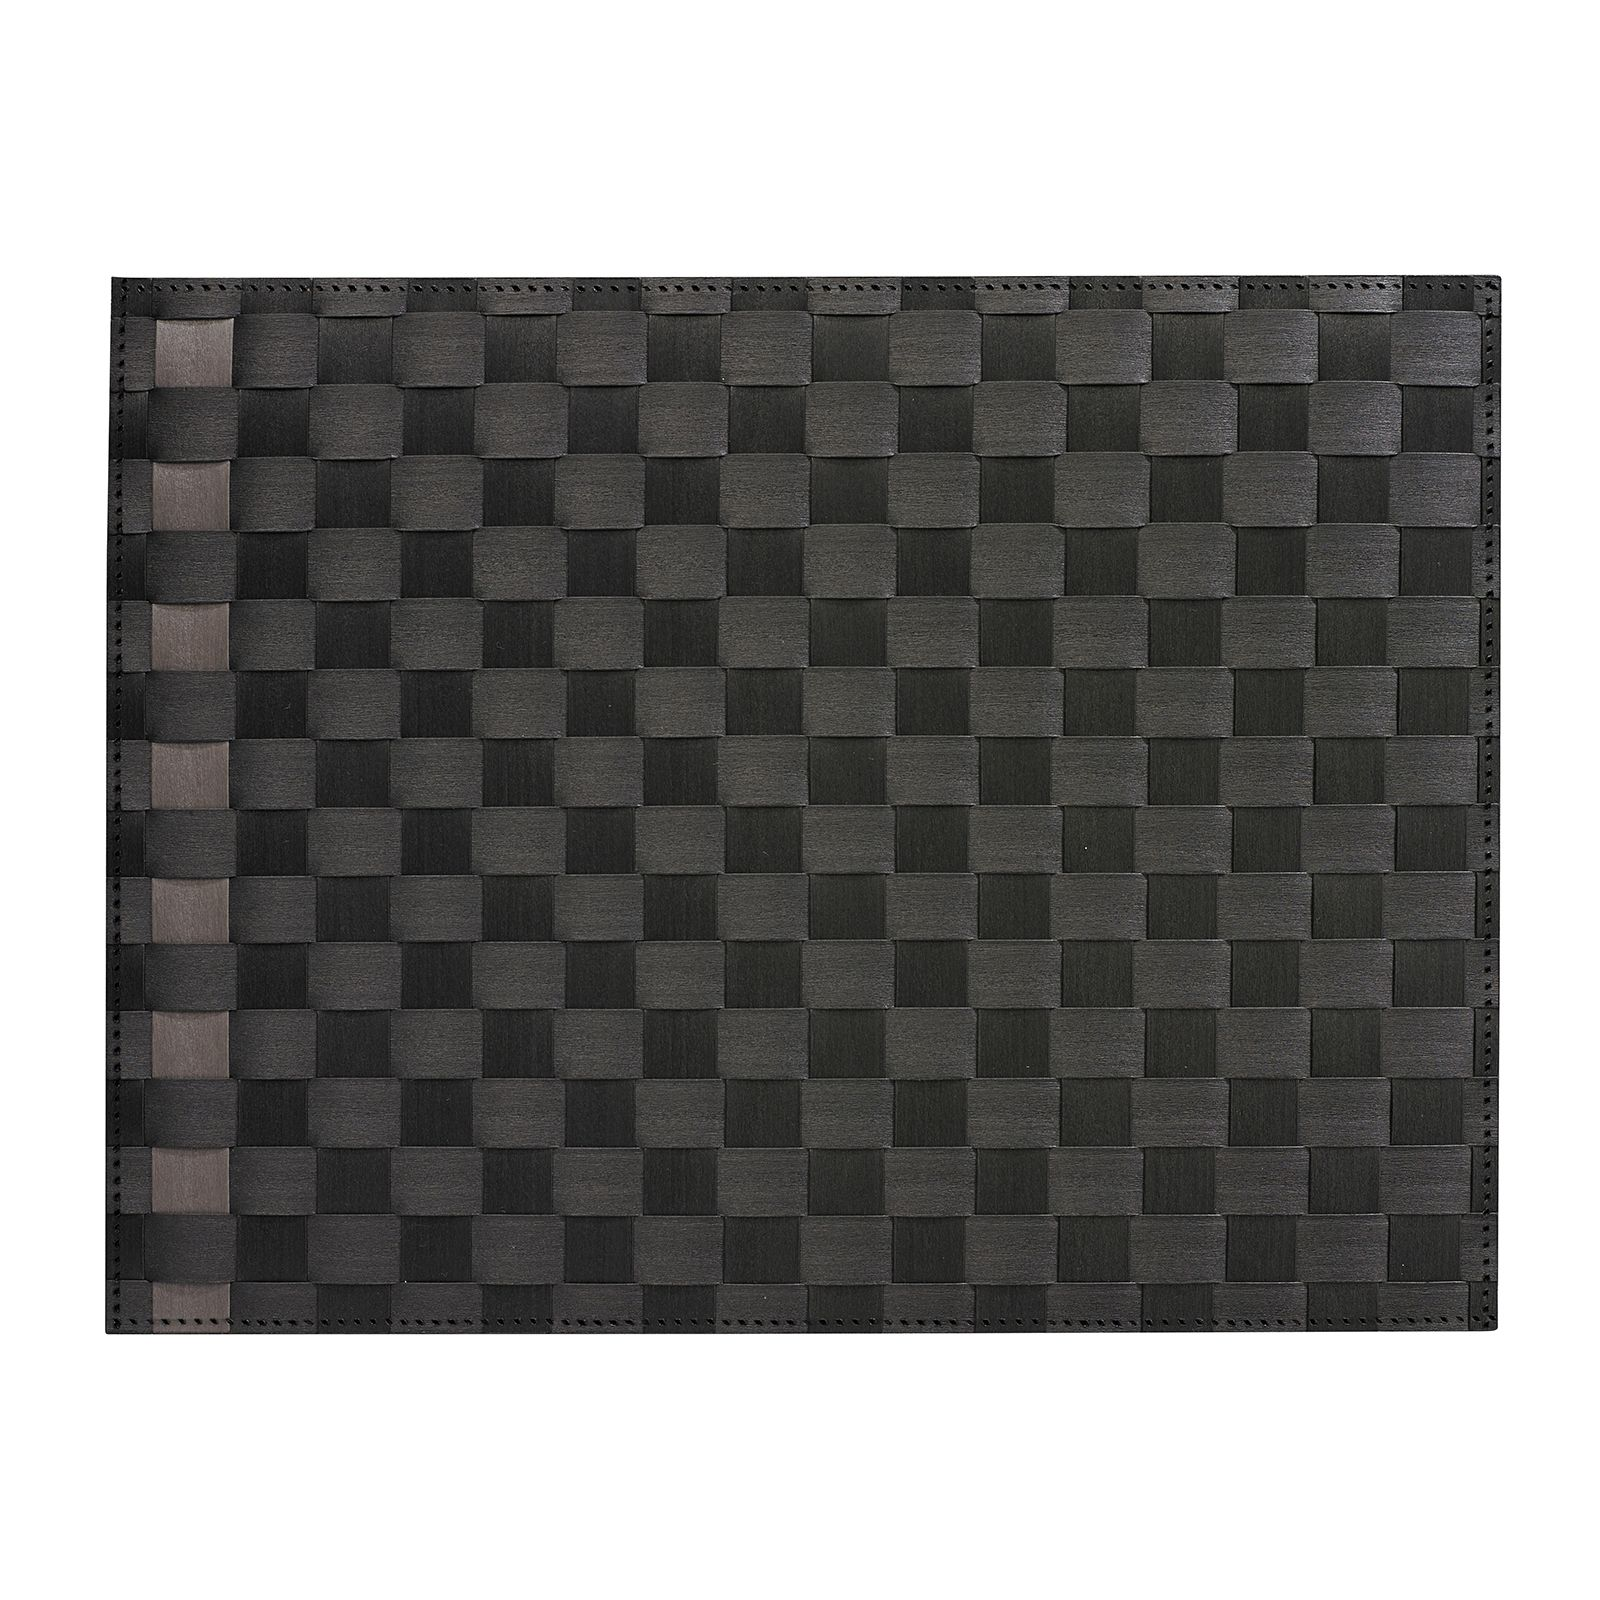 Saleen Placemat - Simplicity - Black+Taupe